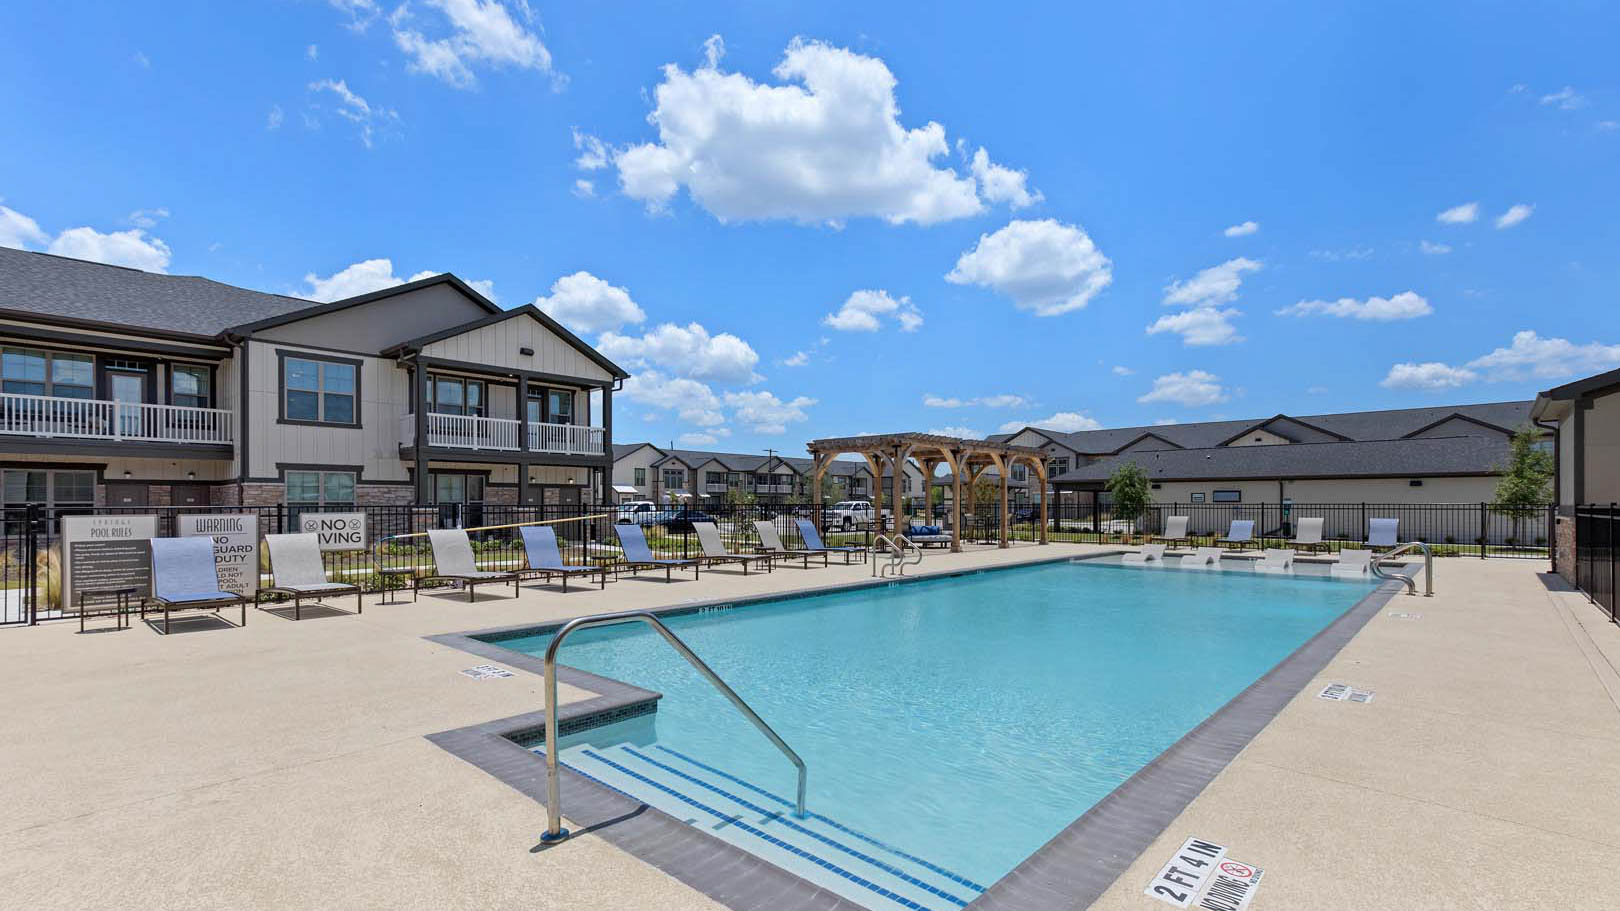 Pool in Rosenberg, TX